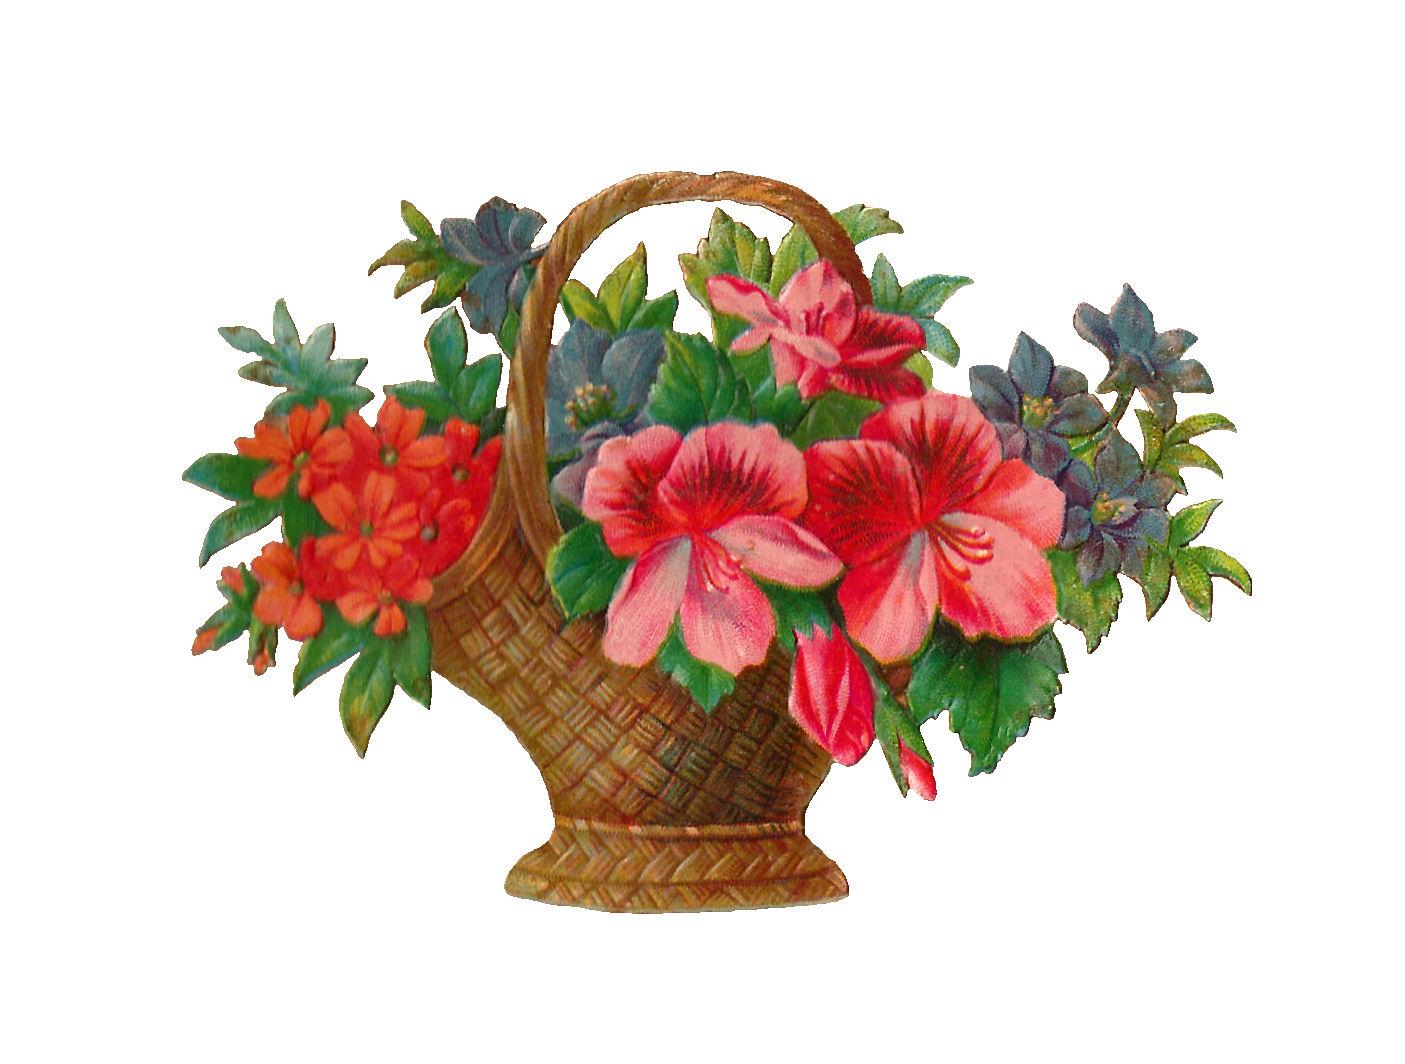 antique images free flower stock image antique flower Summer Clip Art June Clip Art Graphics